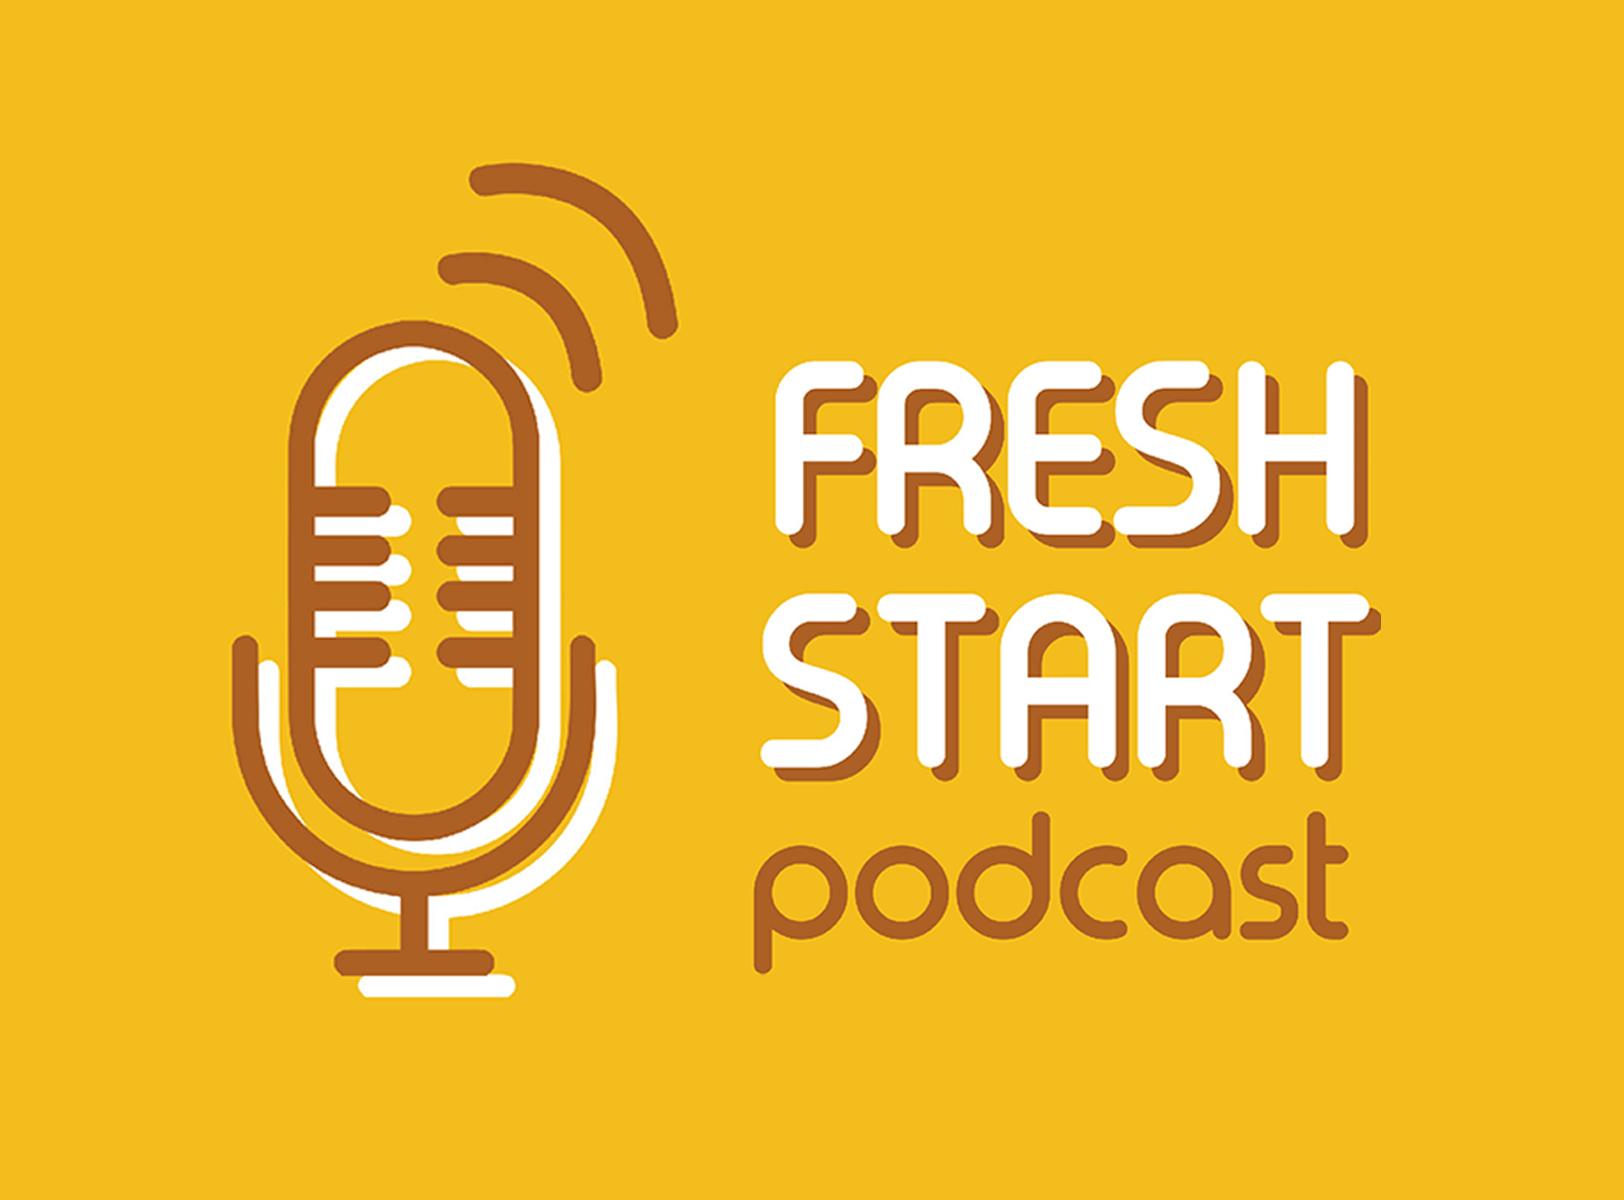 Fresh Start: Podcast News (6/5/2019 Wed.)